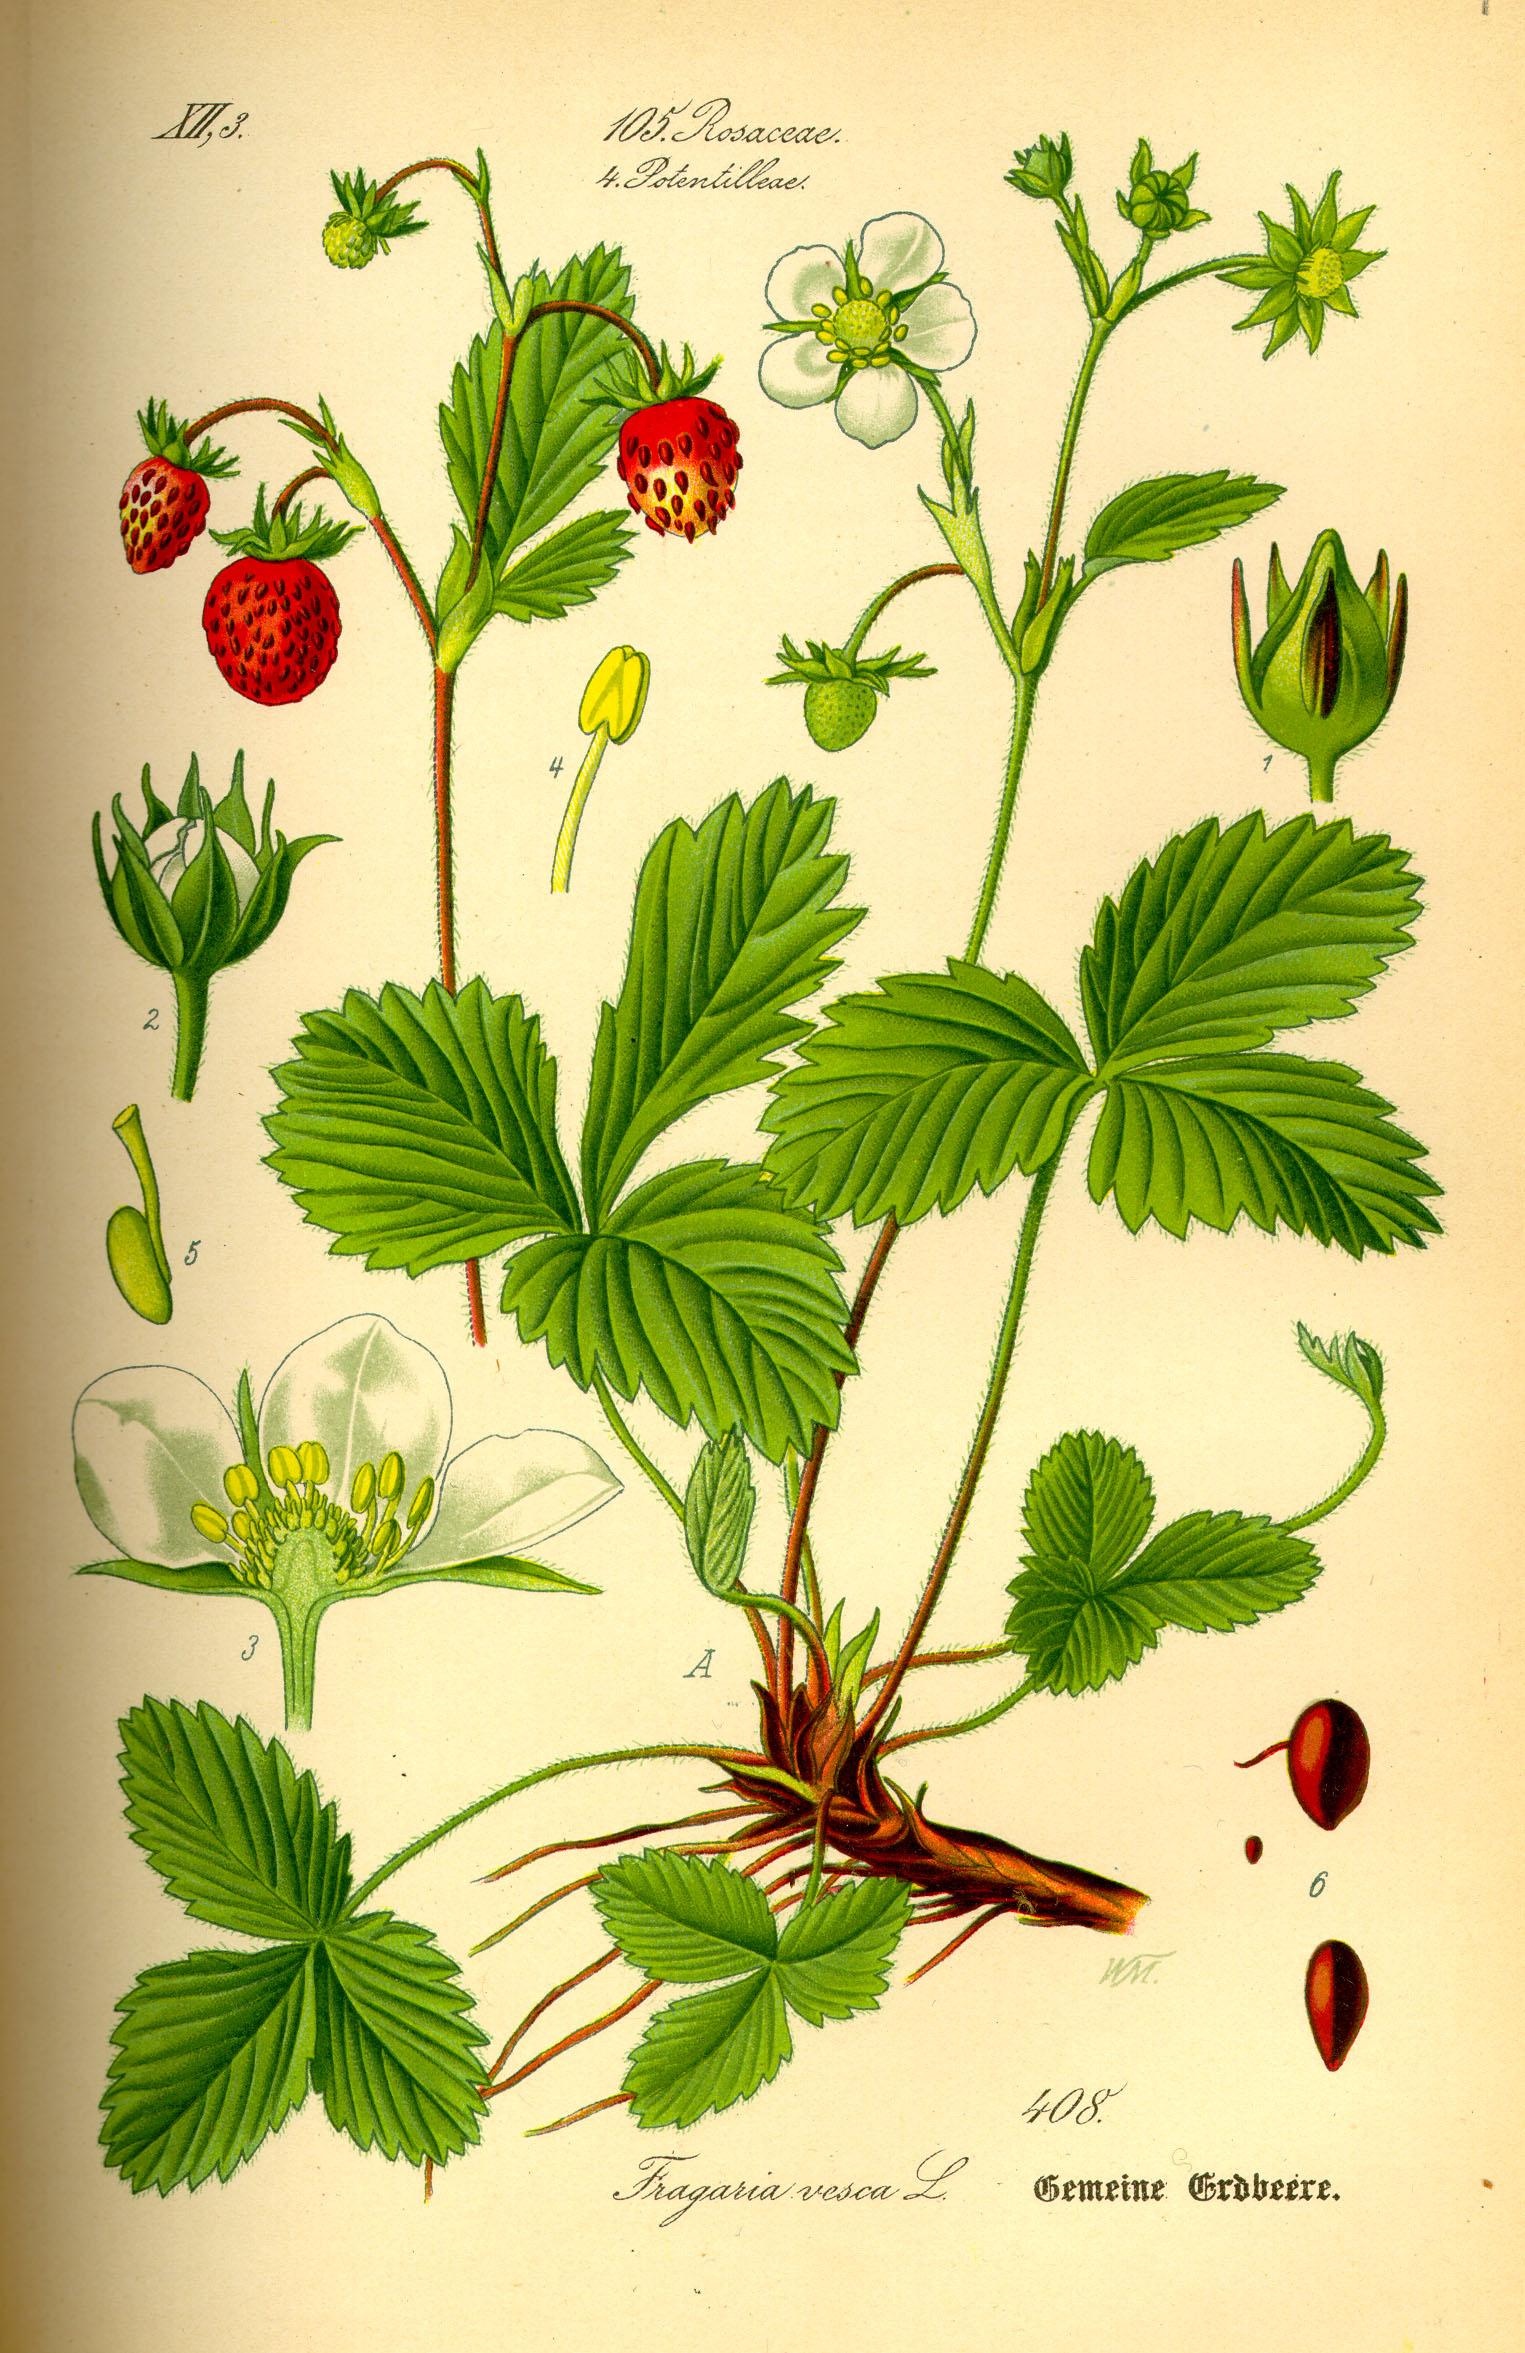 Uw herbarium image collection dresses